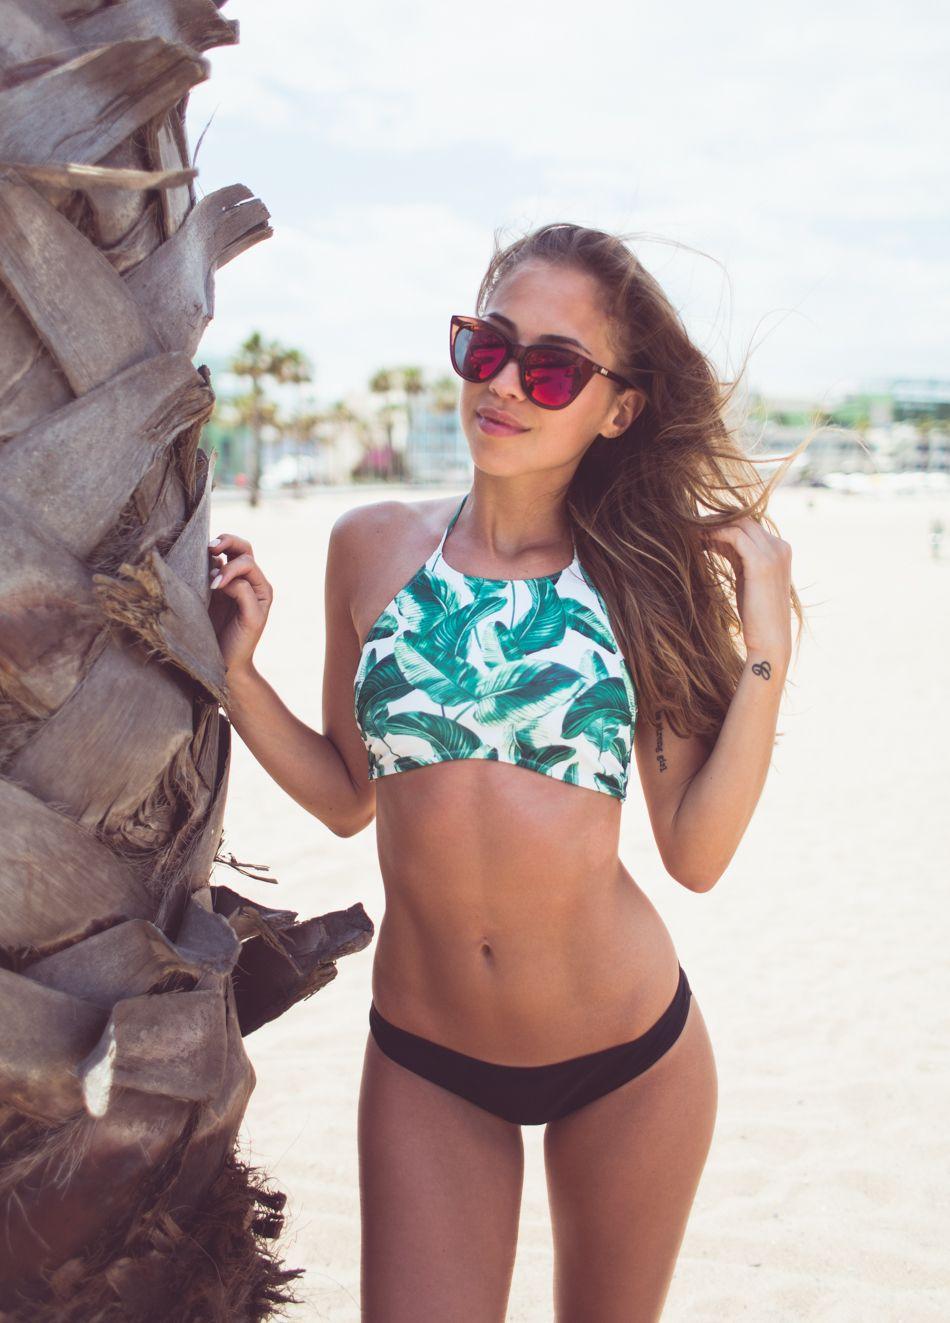 Kenza Zouiten takes to the beach in an H M bikini top with banana leaf  print.  ae466c83bf